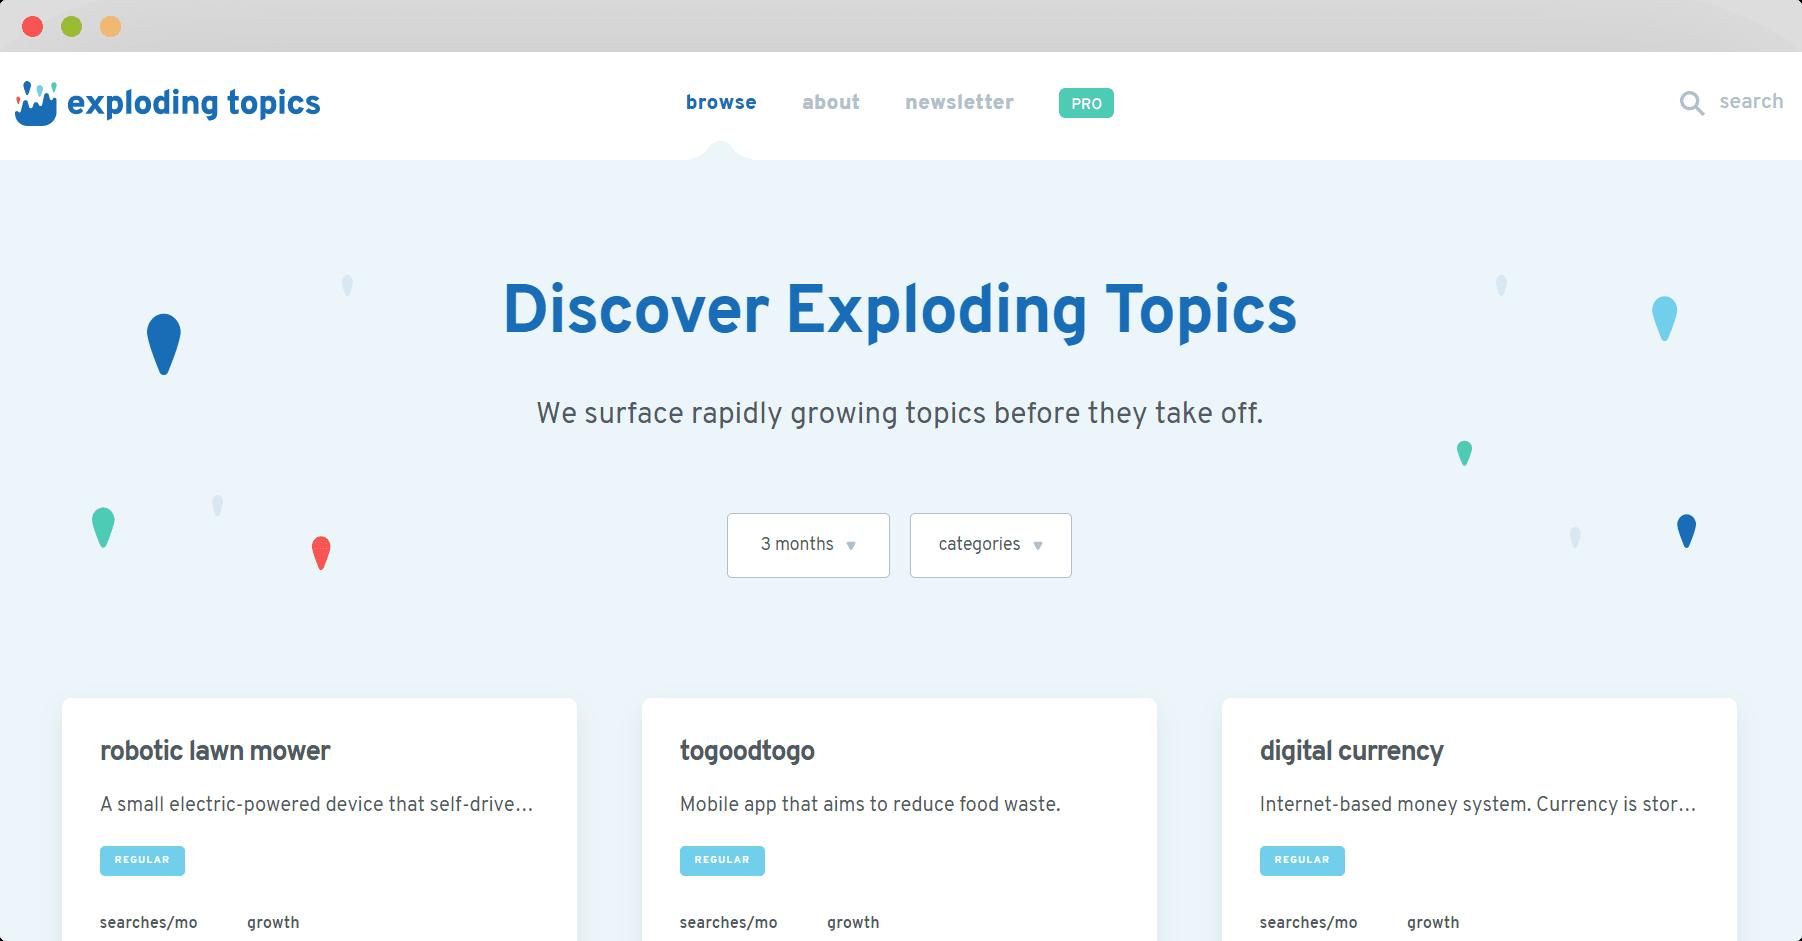 Figure 20 Exploding Topics